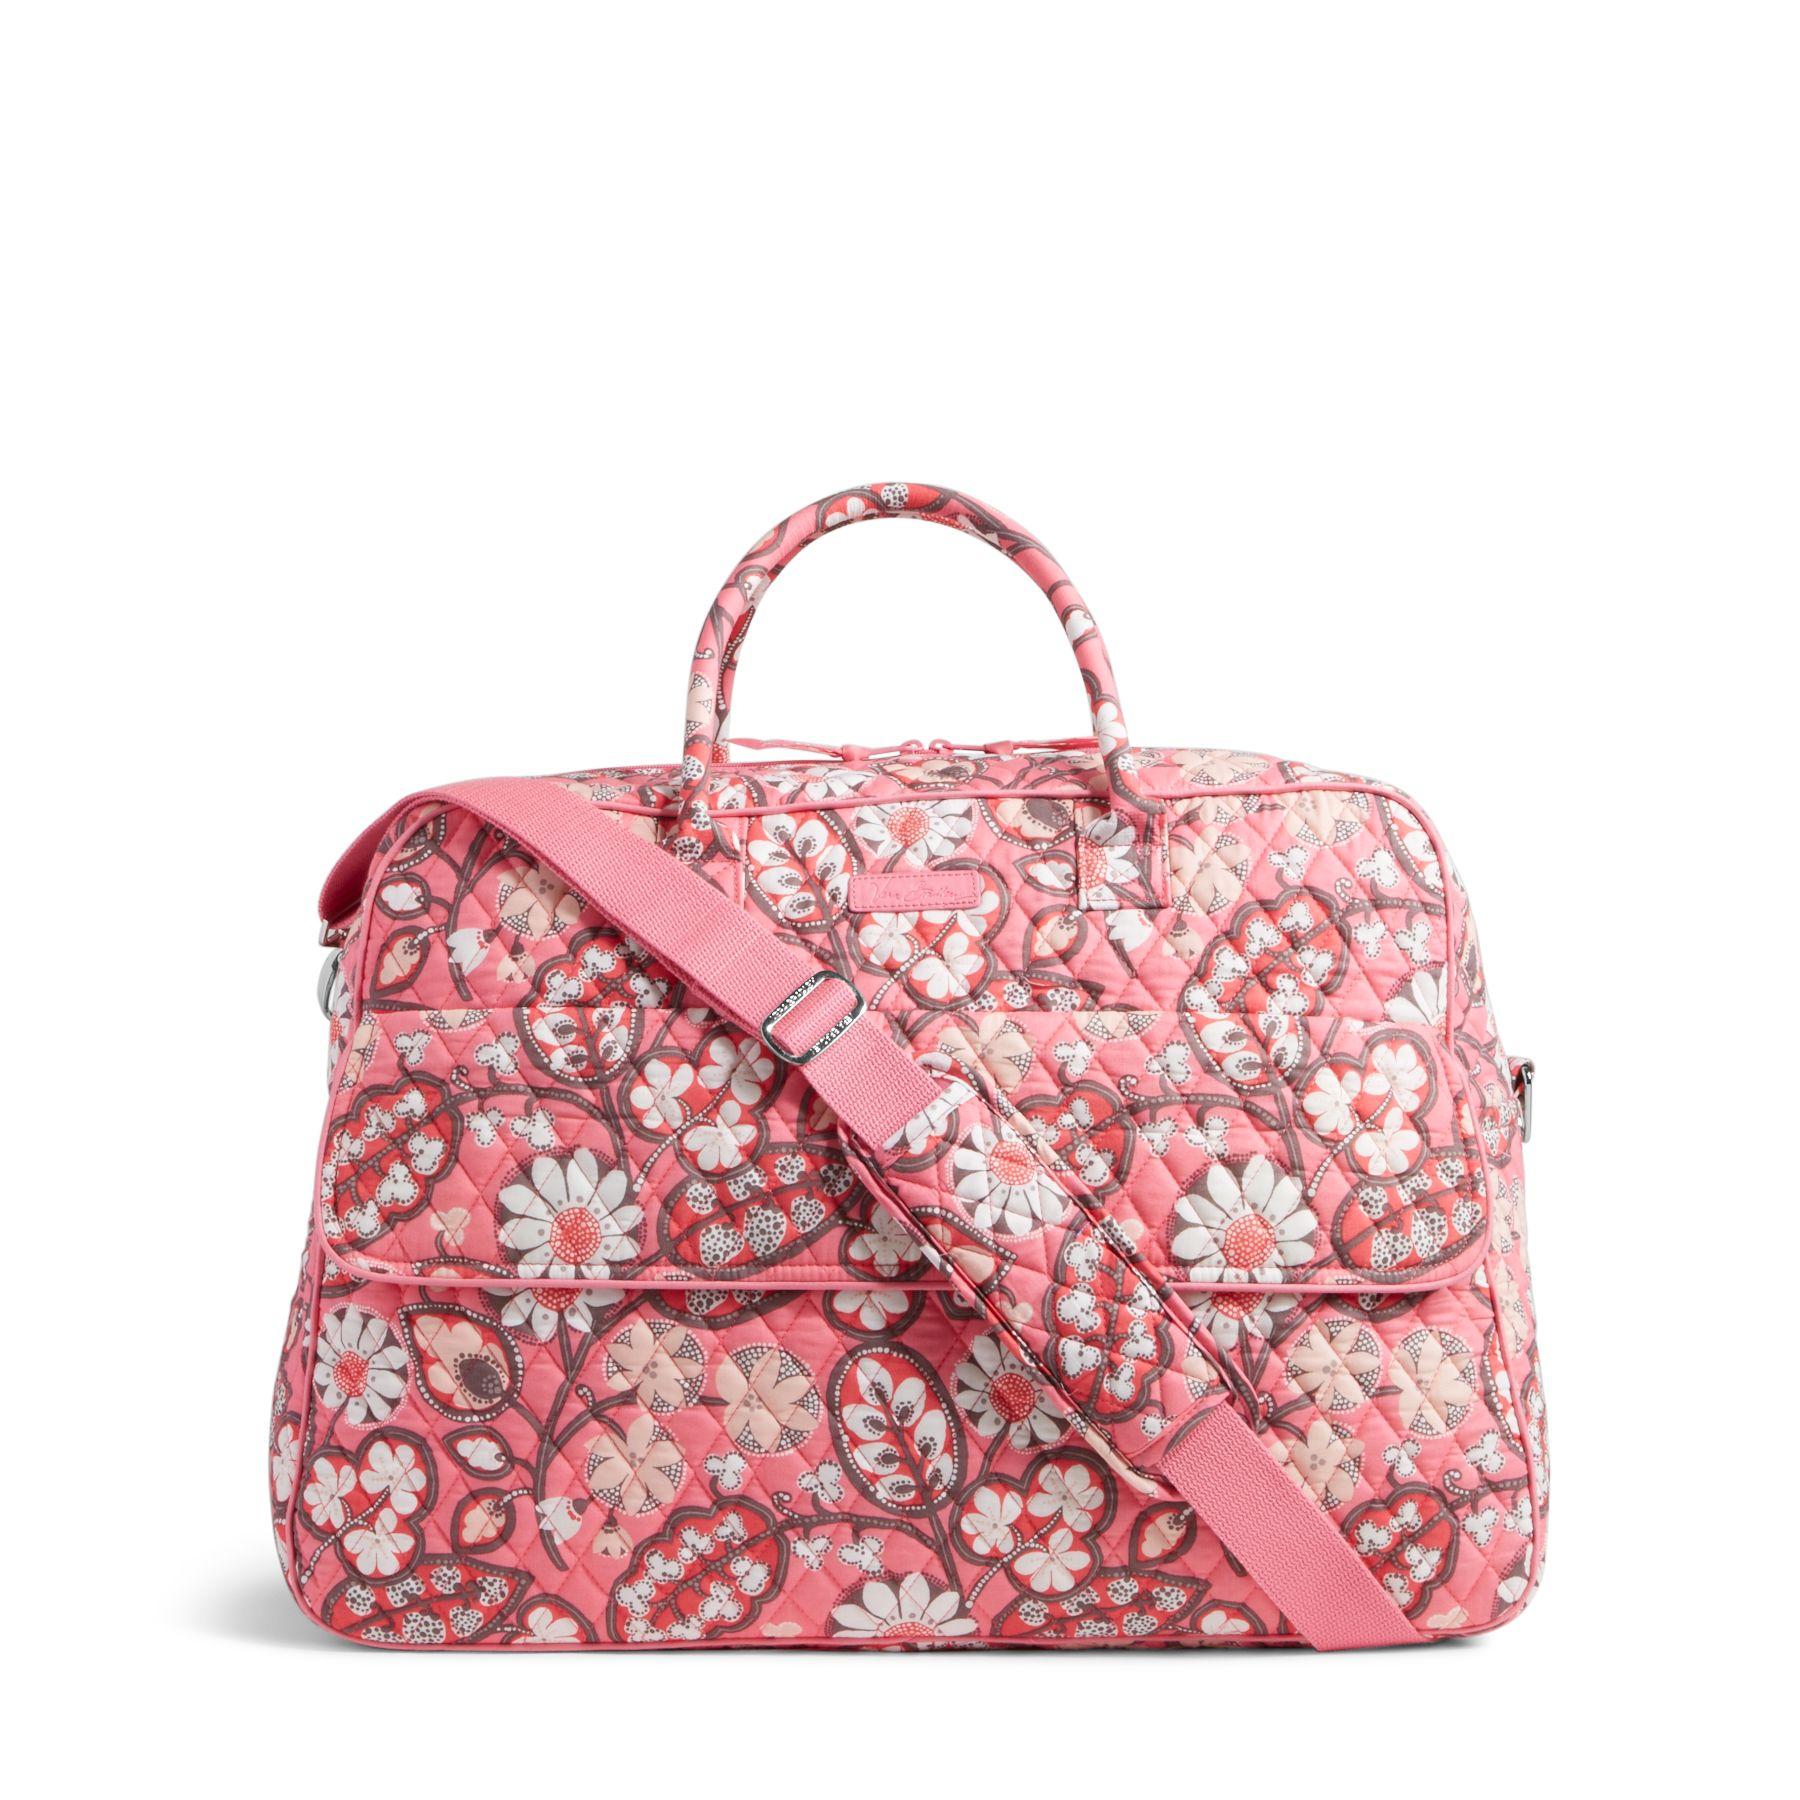 Vera Bradley Factory Exclusive Small Duffel Travel Bag